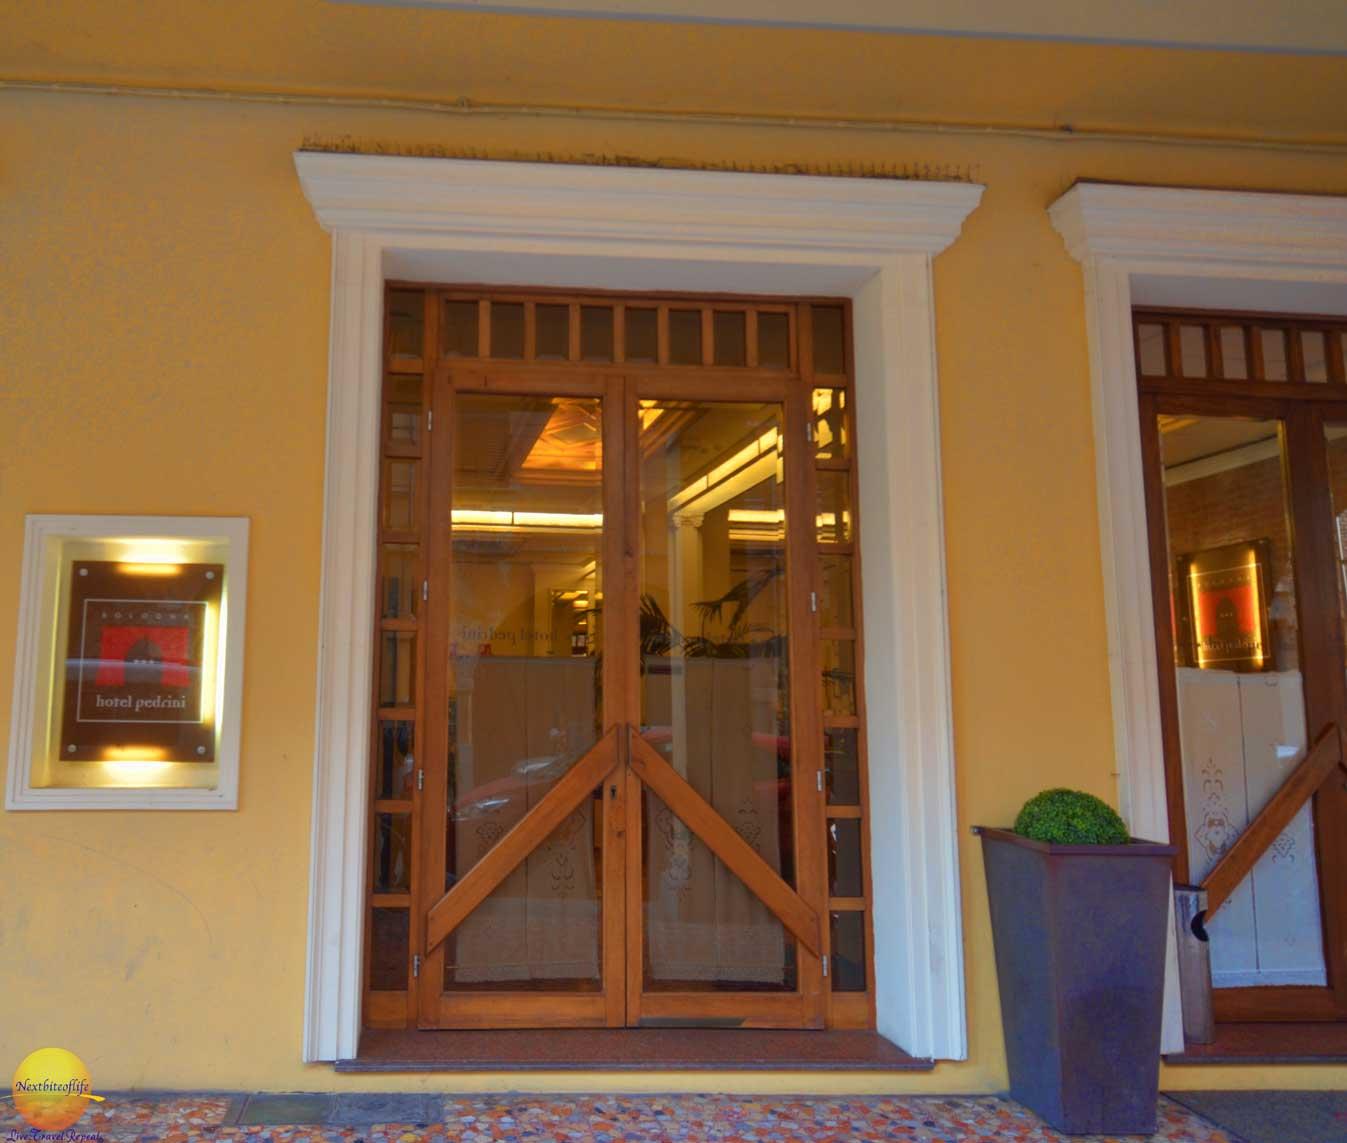 bologna italy photel pedrini entrance